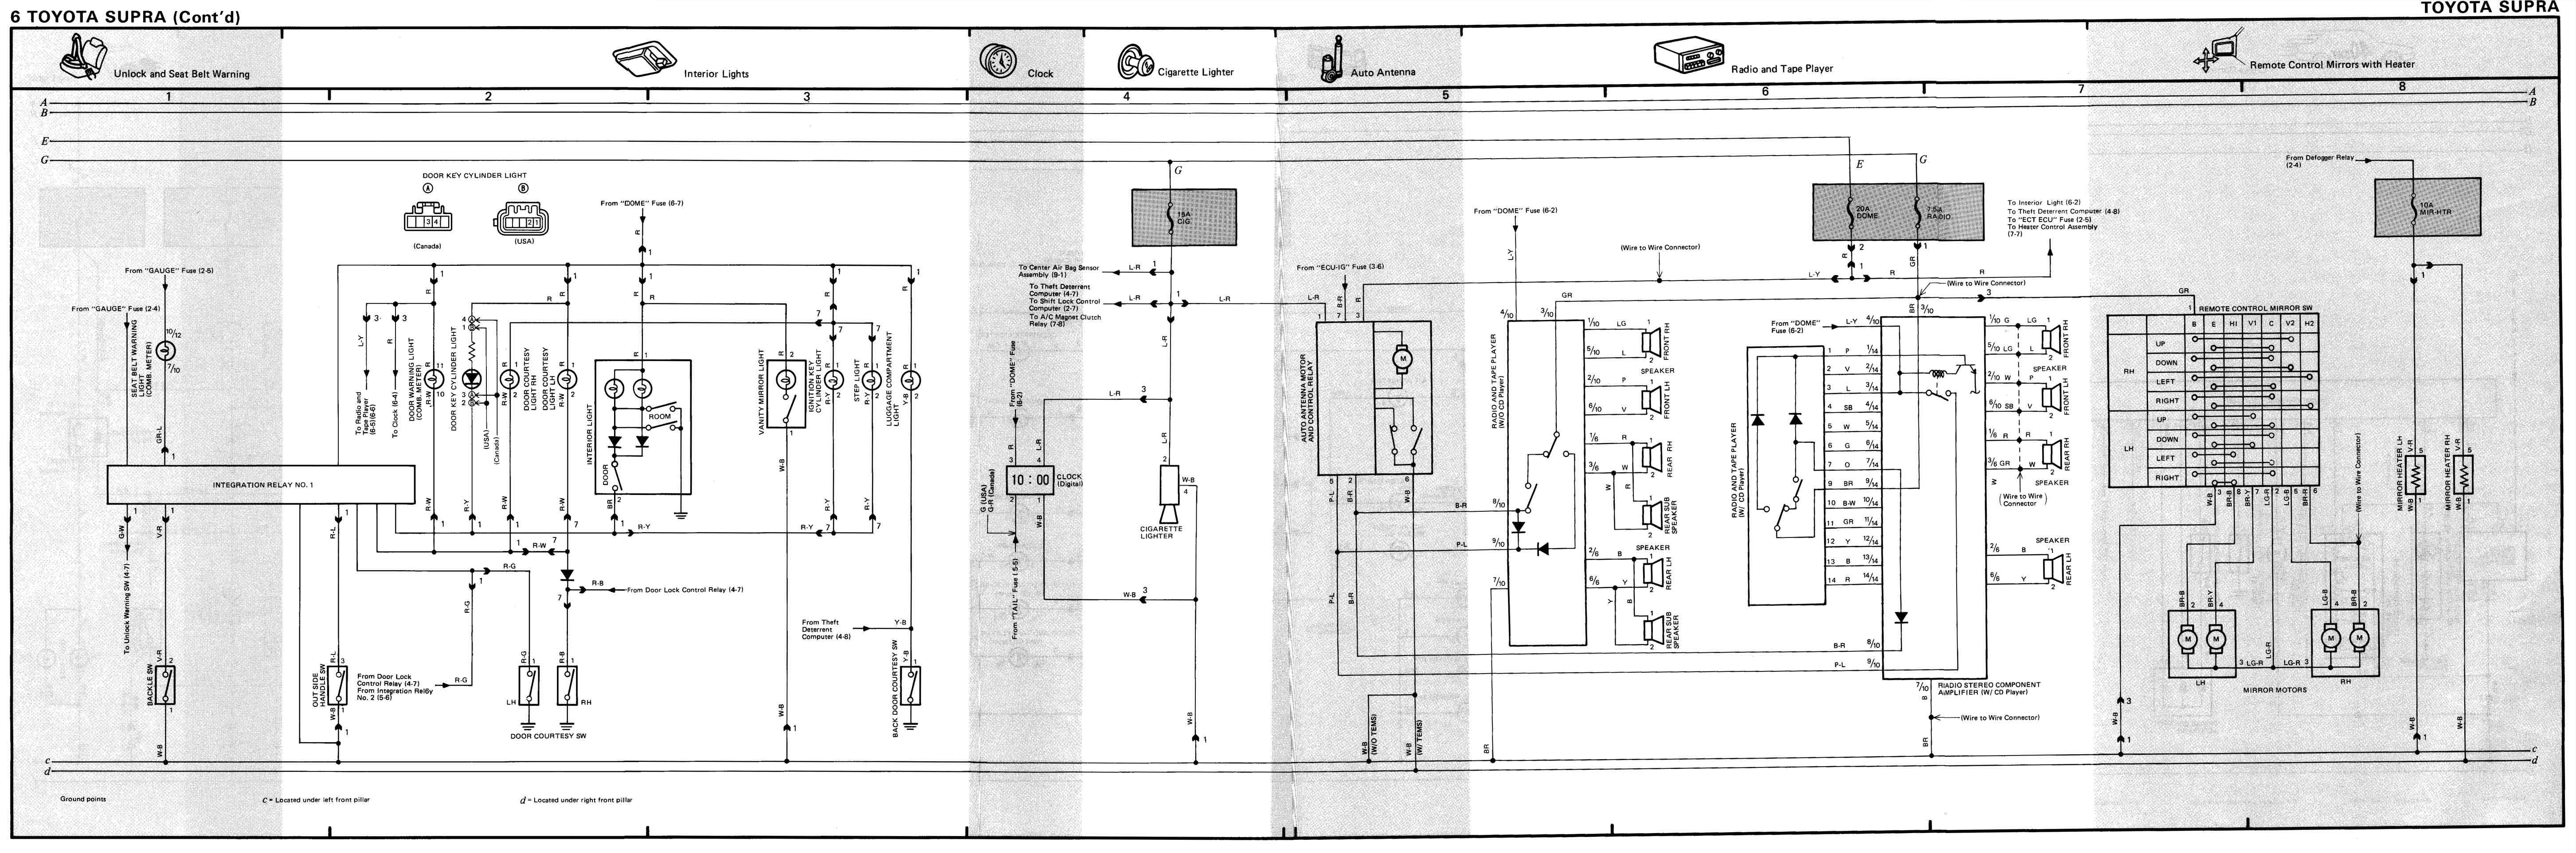 Excellent 87 Supra Vacuum Diagram Wiring Schematic General Wiring Diagram Data Wiring Cloud Domeilariaidewilluminateatxorg